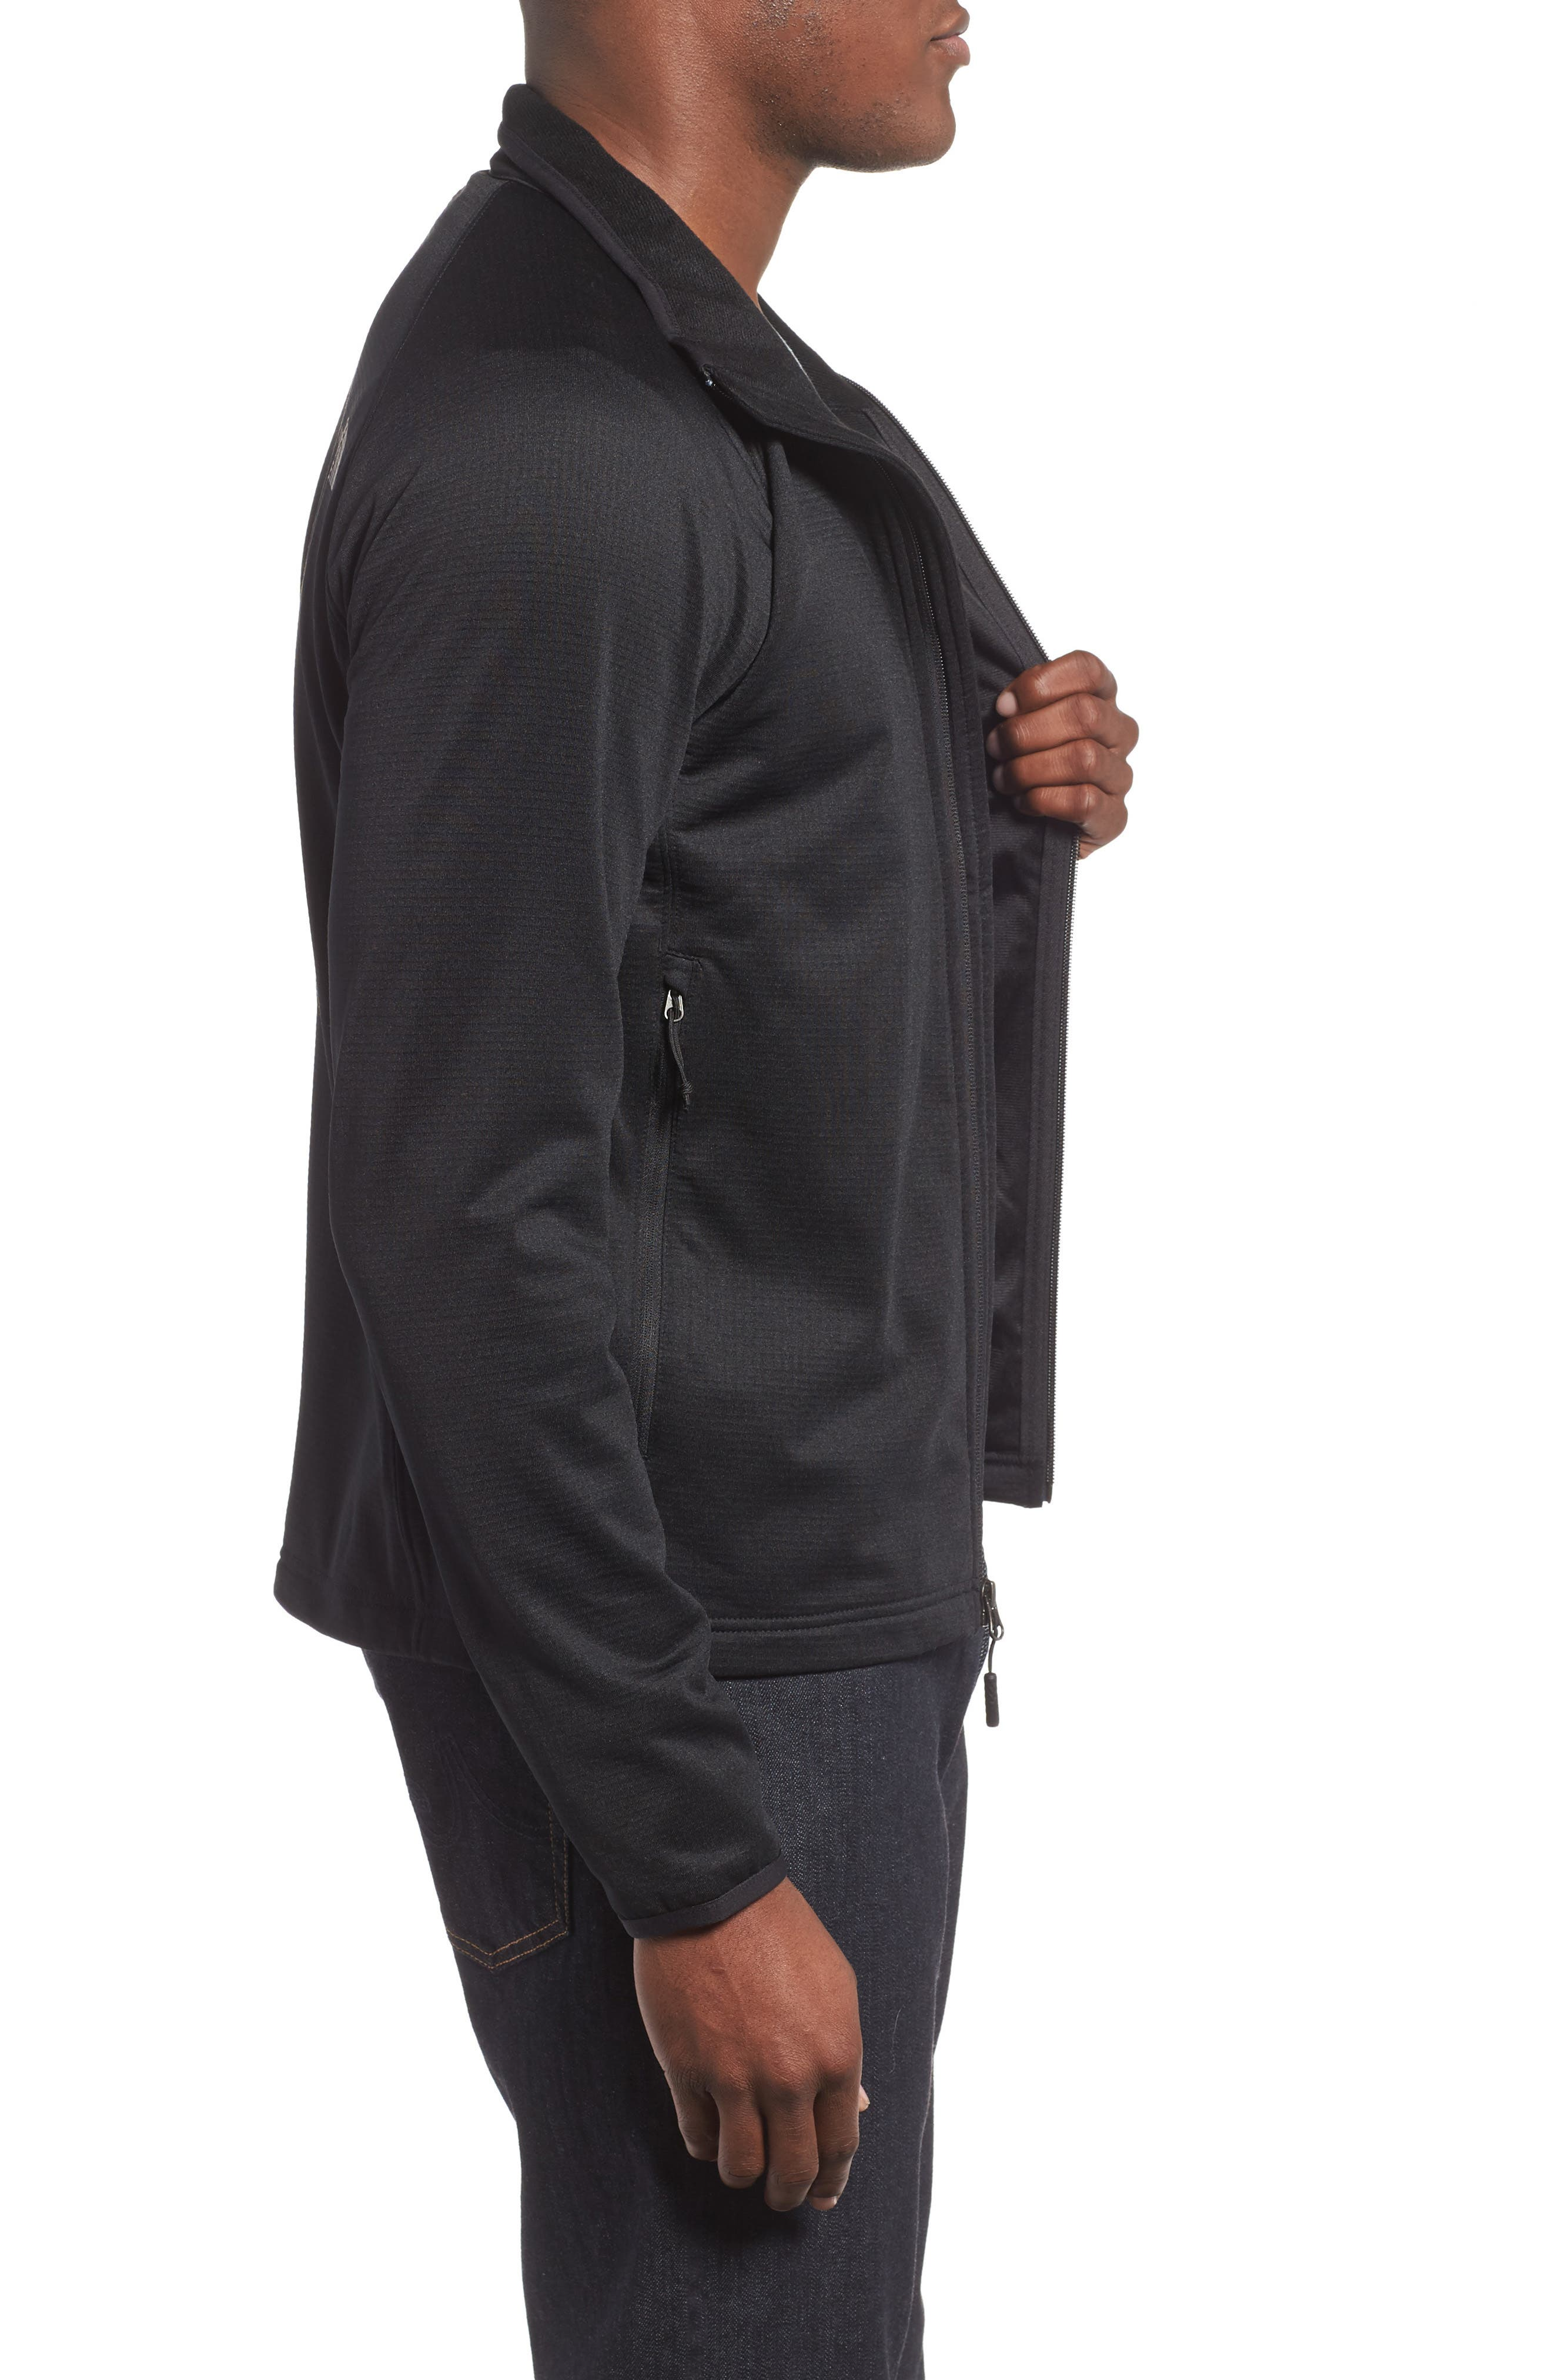 Borod Jacket,                             Alternate thumbnail 3, color,                             TNF BLACK/ TNF BLACK